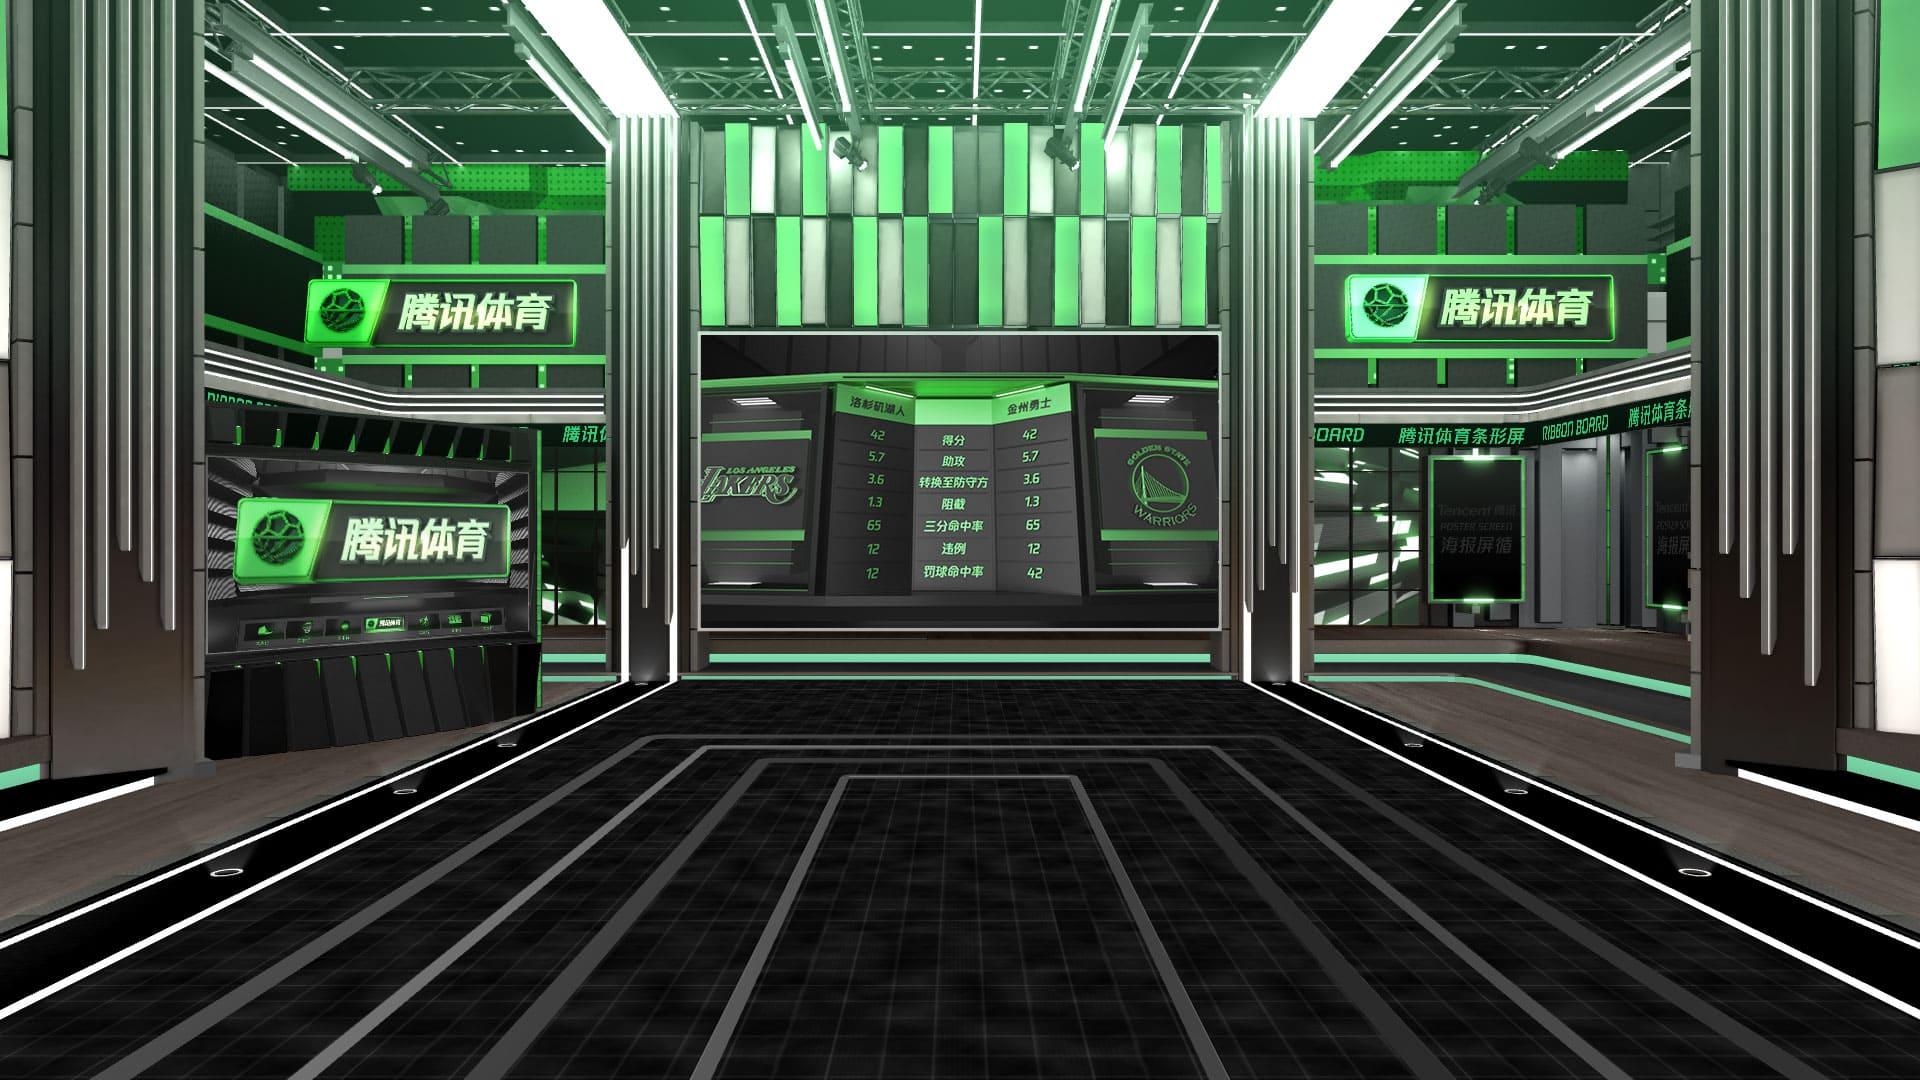 2019 Tencent Virtual Set 05 Girraphic